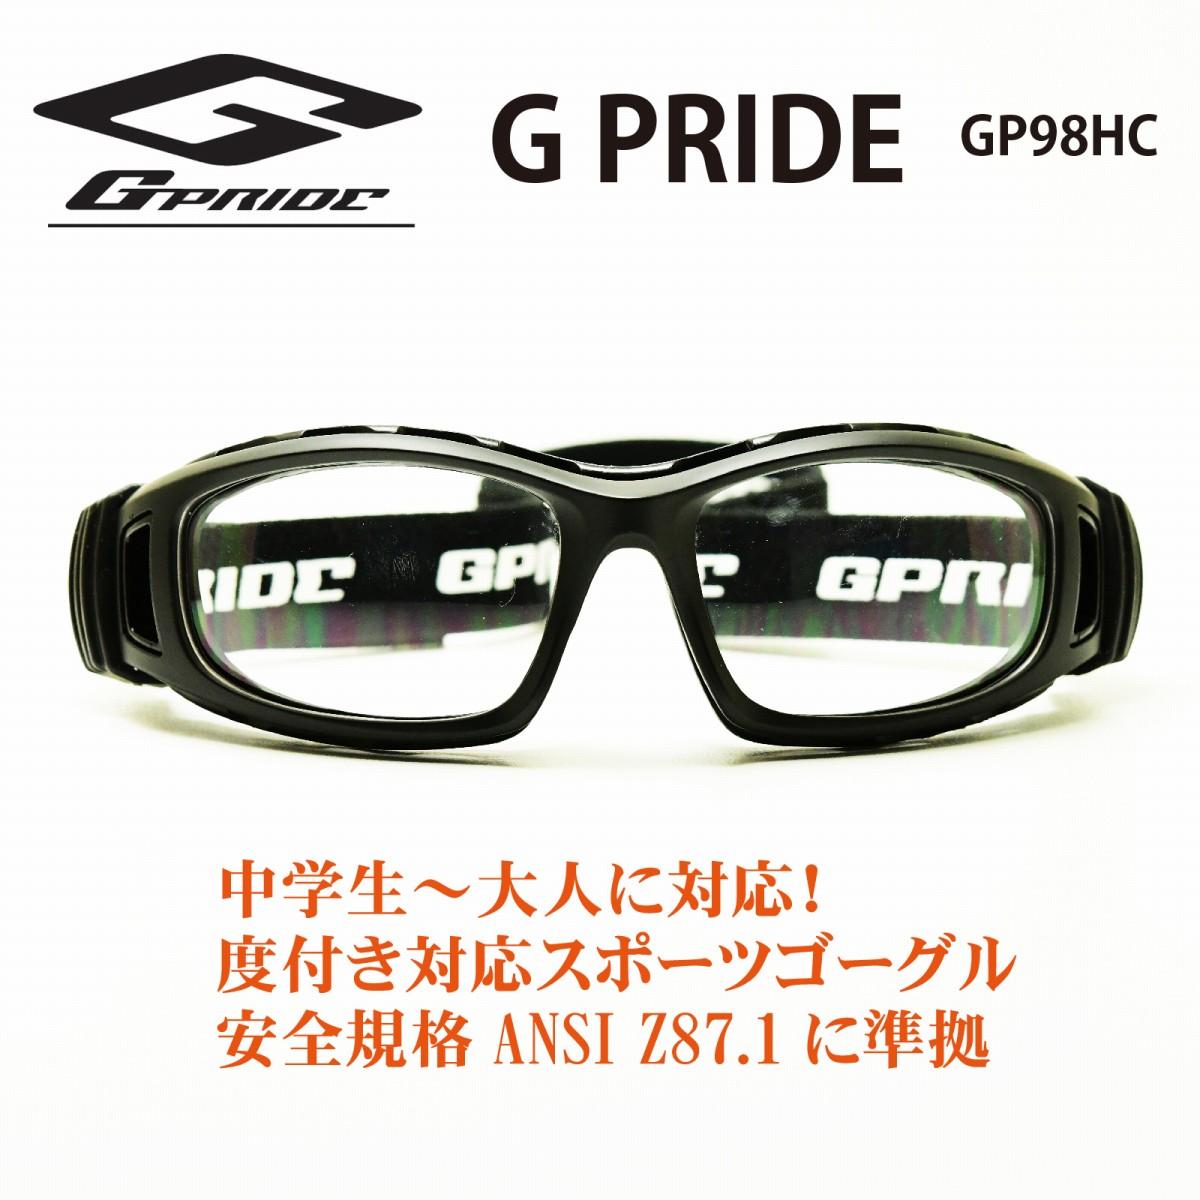 GPRIDE EYE-GLOVEGP98HC ハイカーブモデル度数に合わせてレンズをお選びください通常納期3~8日営業日スポーツ用メガネ スポーツ用ゴーグル サッカー用メガネスポーツの接触事故や衝撃から目を守る